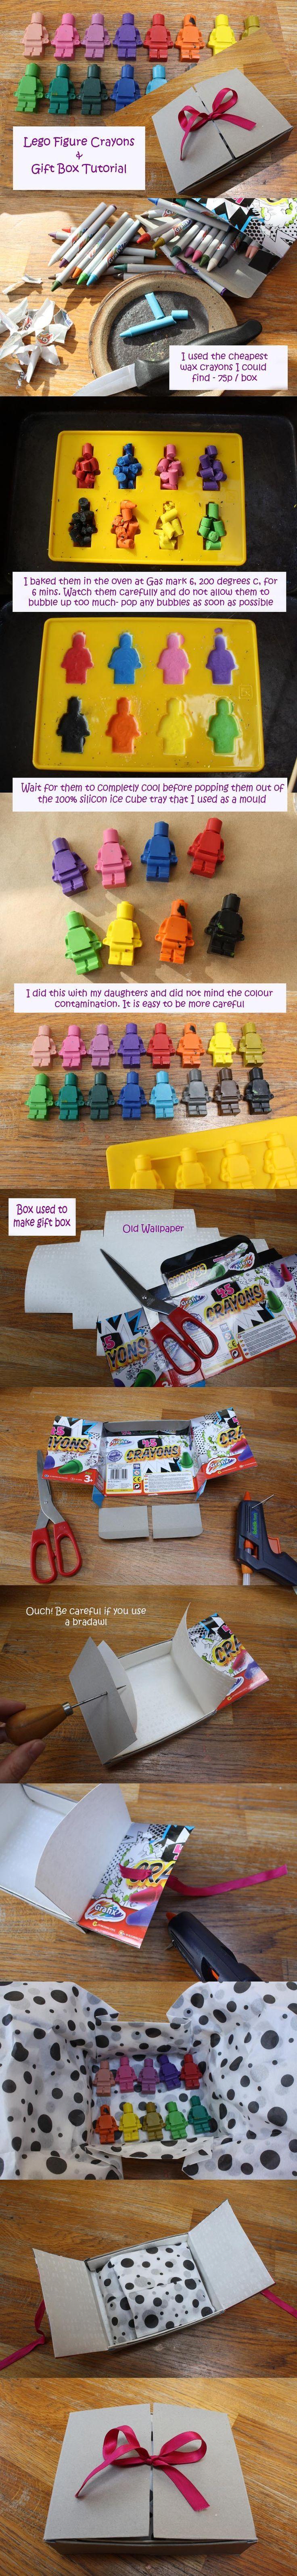 Make It: Lego Man Crayons - Tutorial #kids DIY, Do It Yourself, #DIY